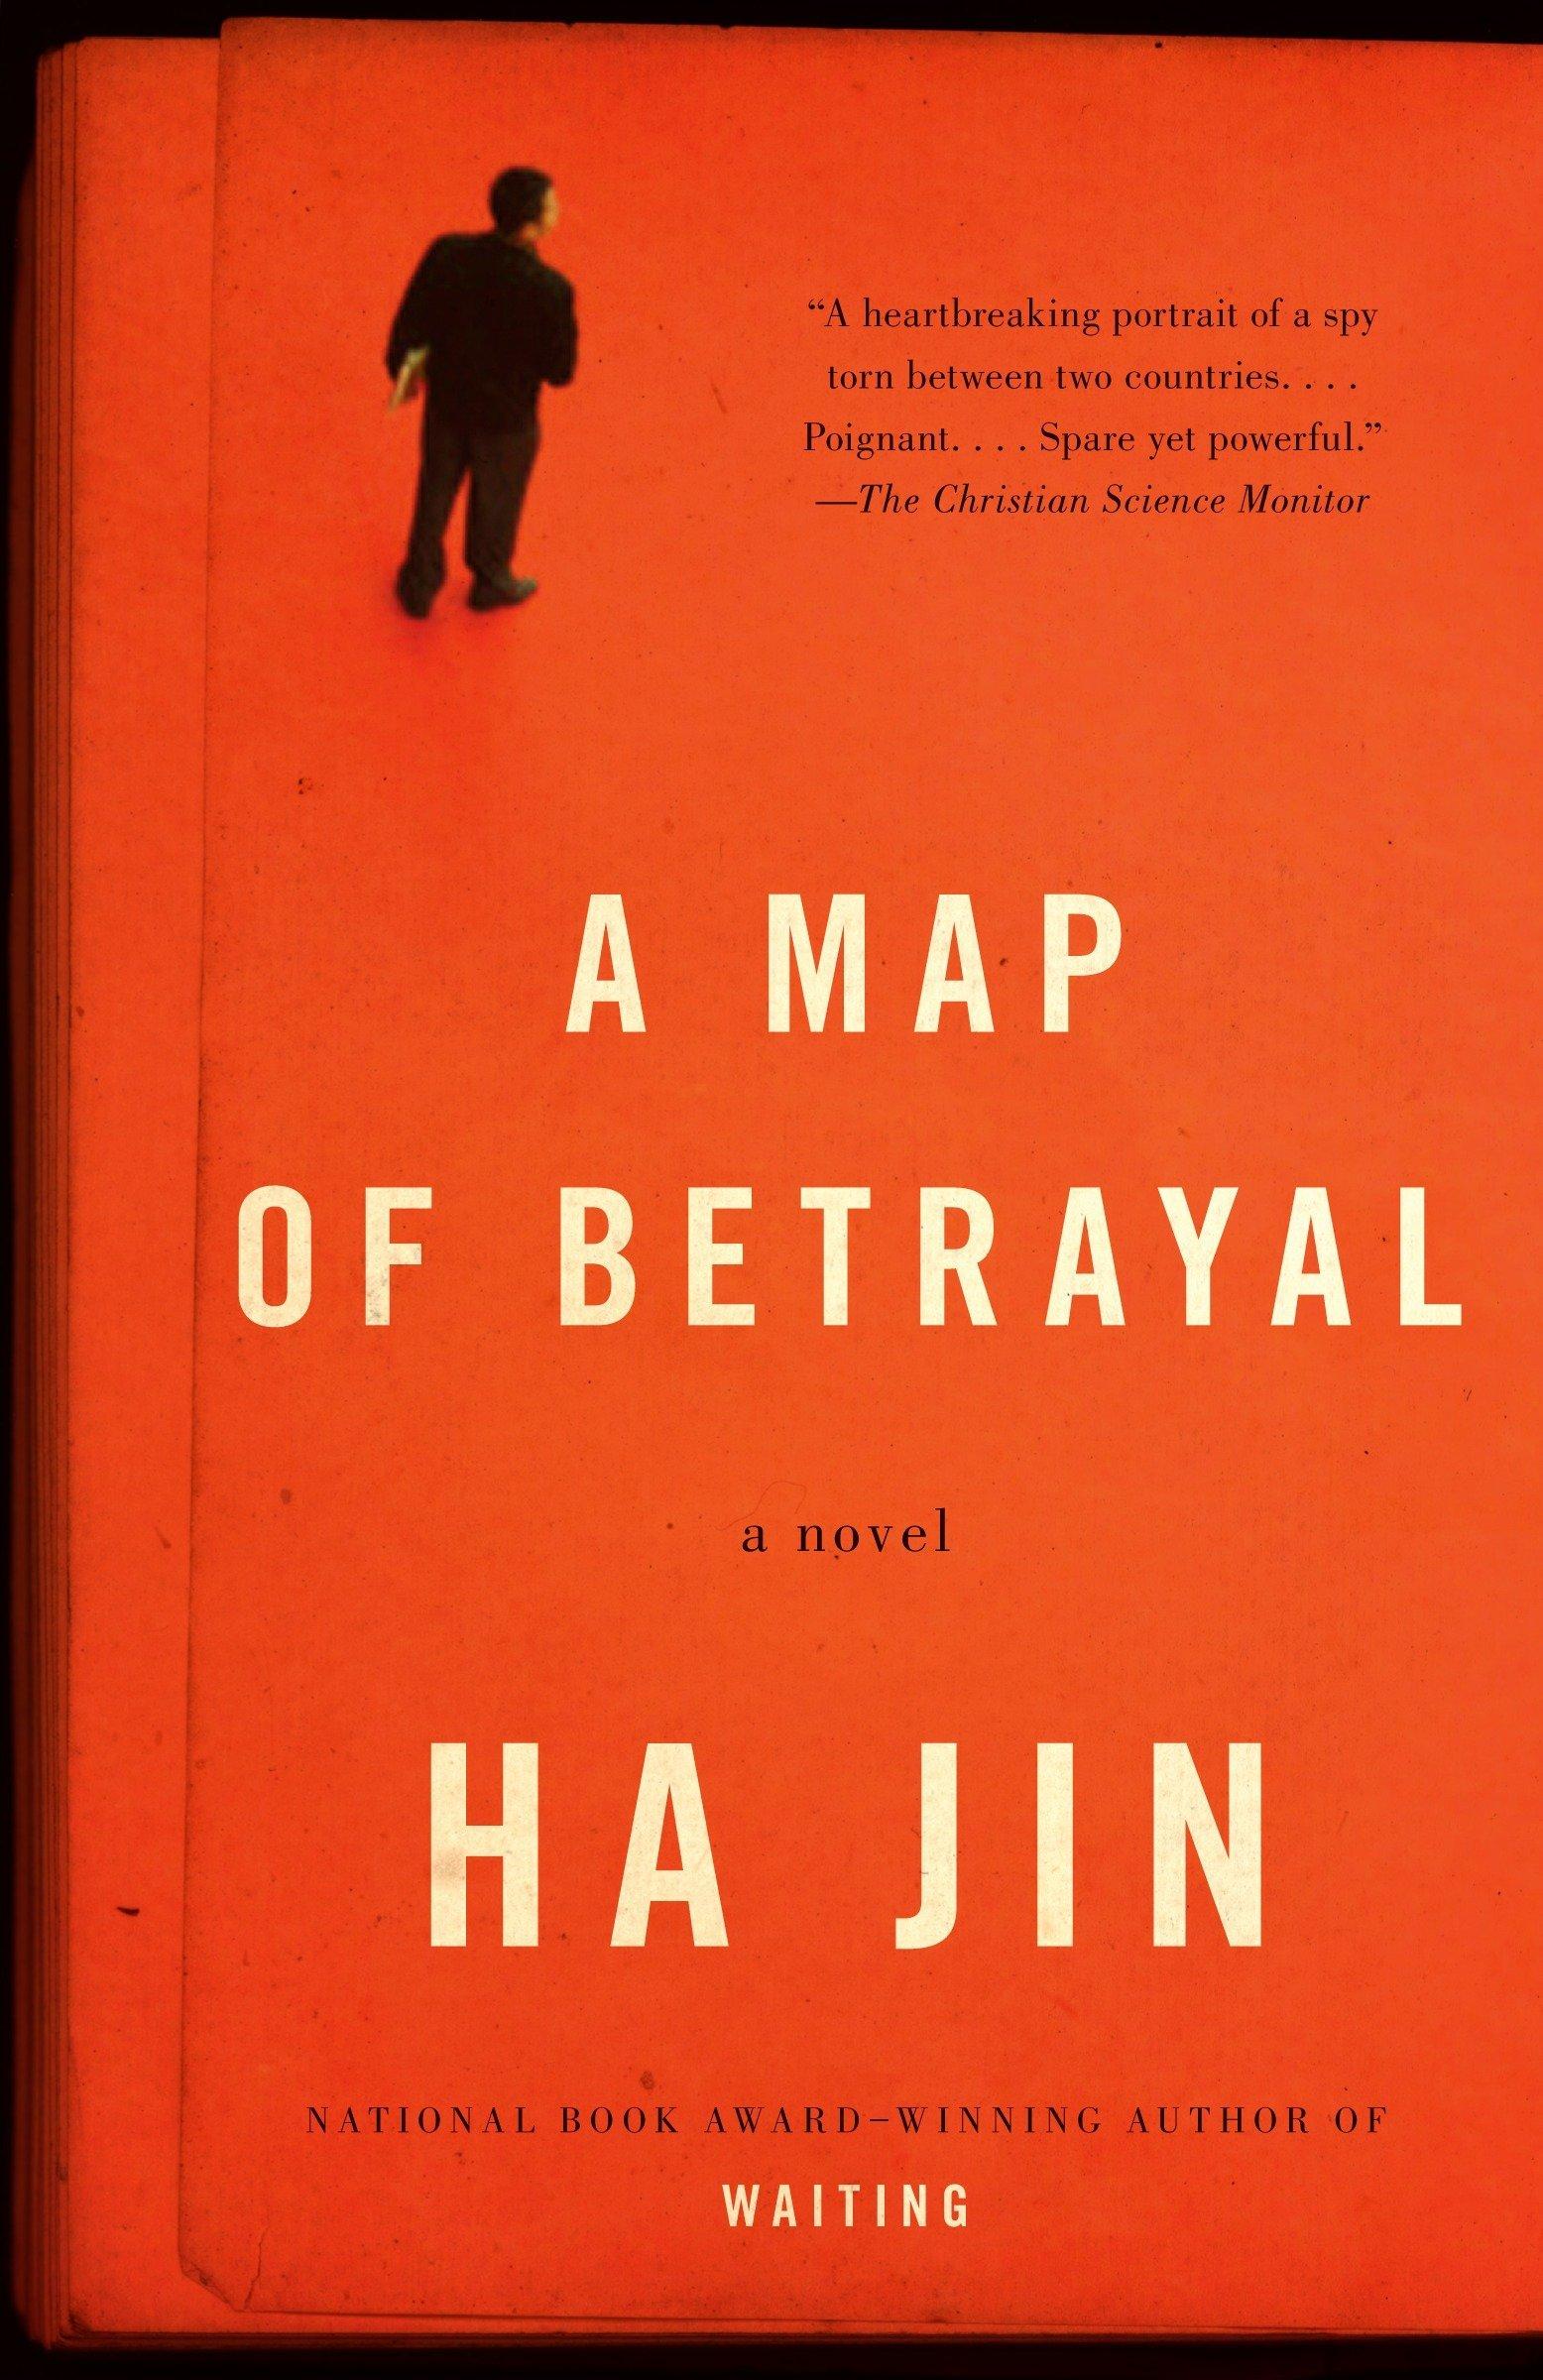 Download A Map of Betrayal: A Novel (Vintage International) PDF